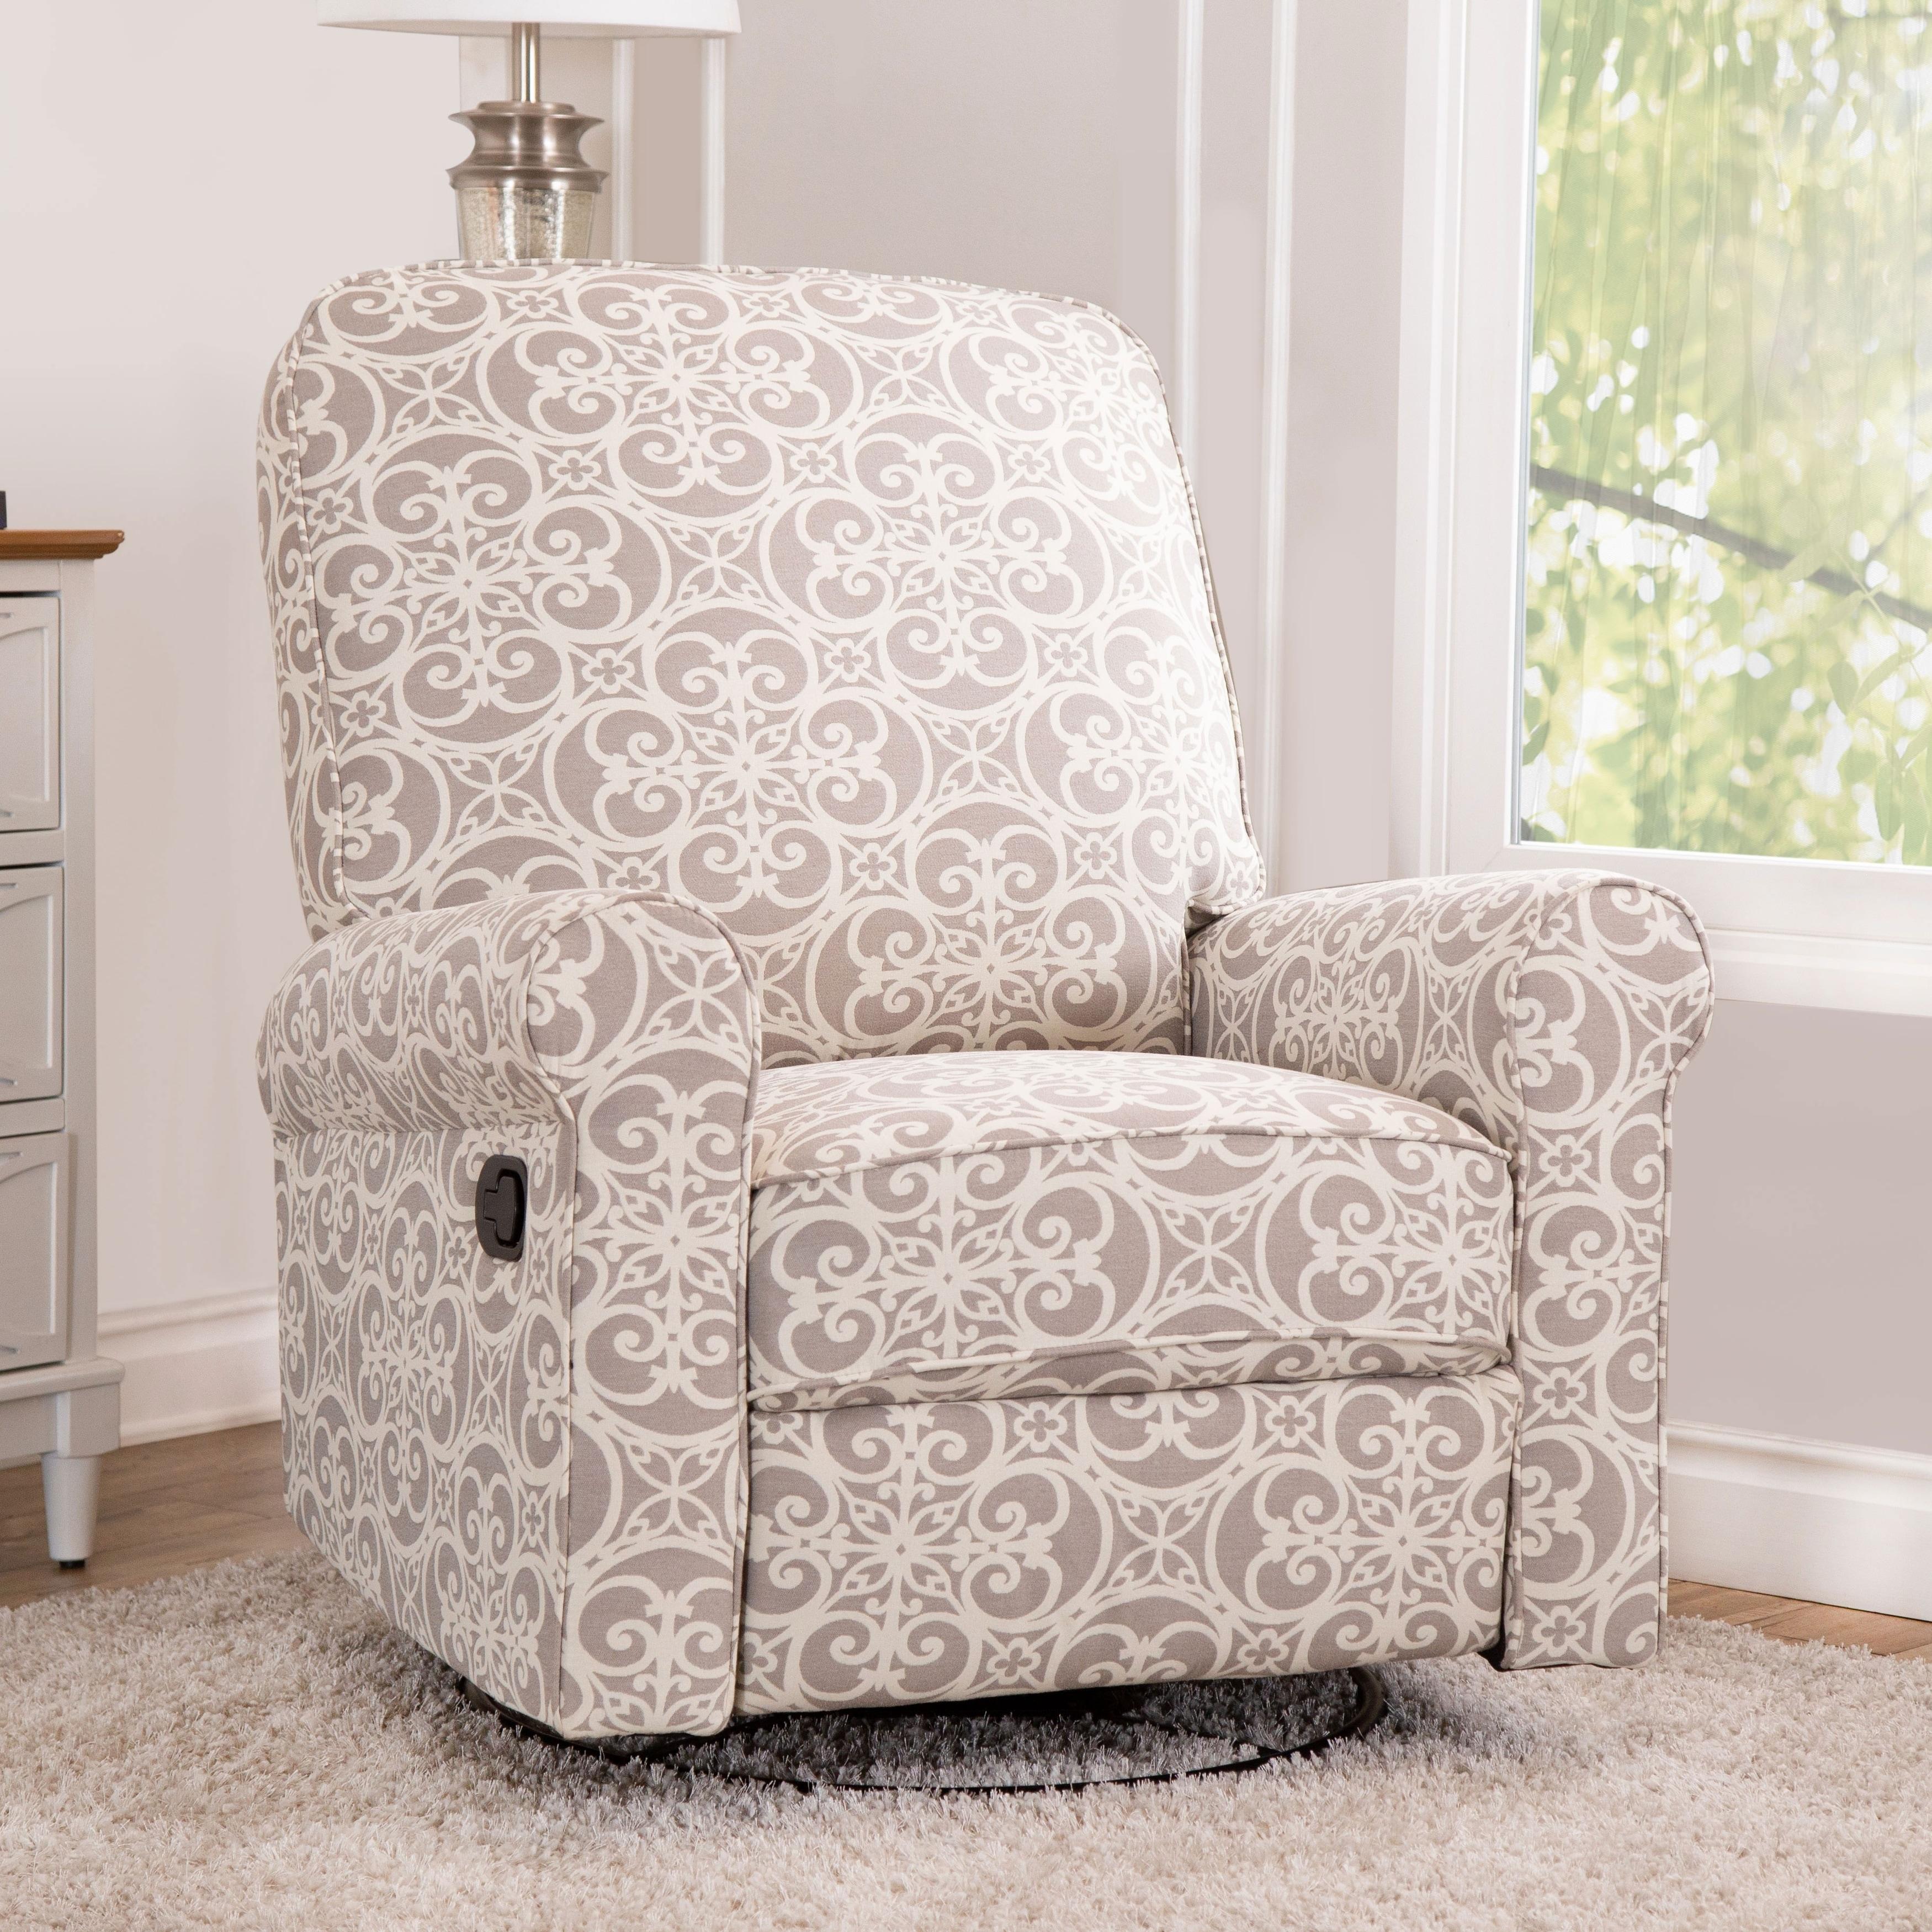 Swivel Recliner Chairs Fabric | Swivel Chairs